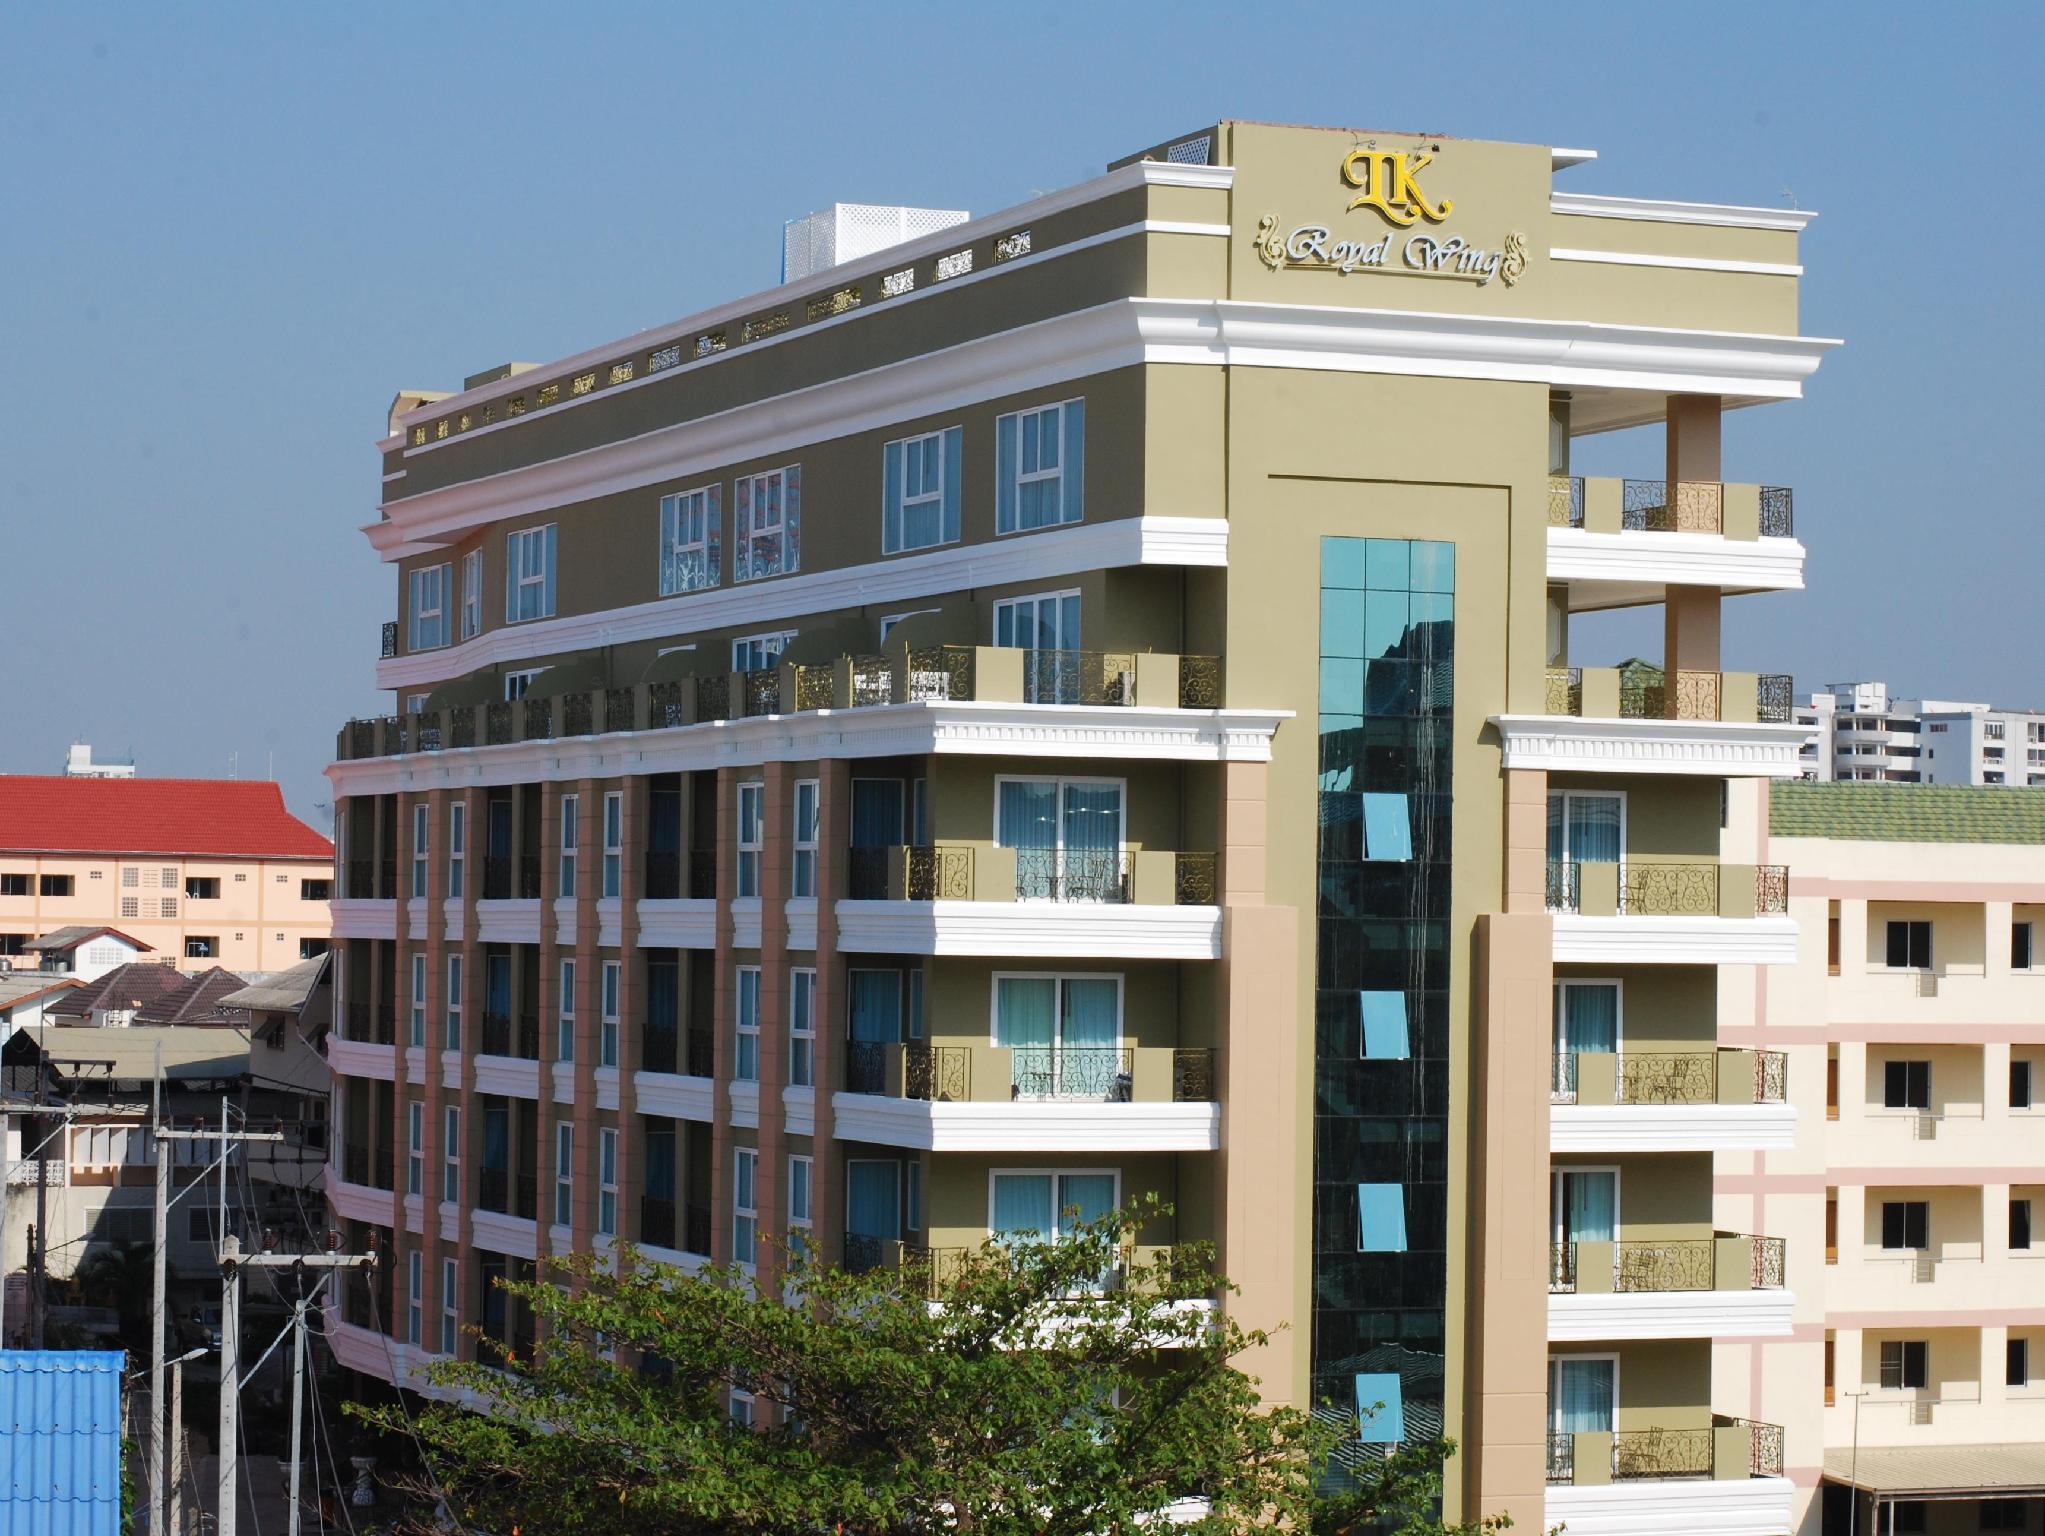 LK Royal Wing Hotel